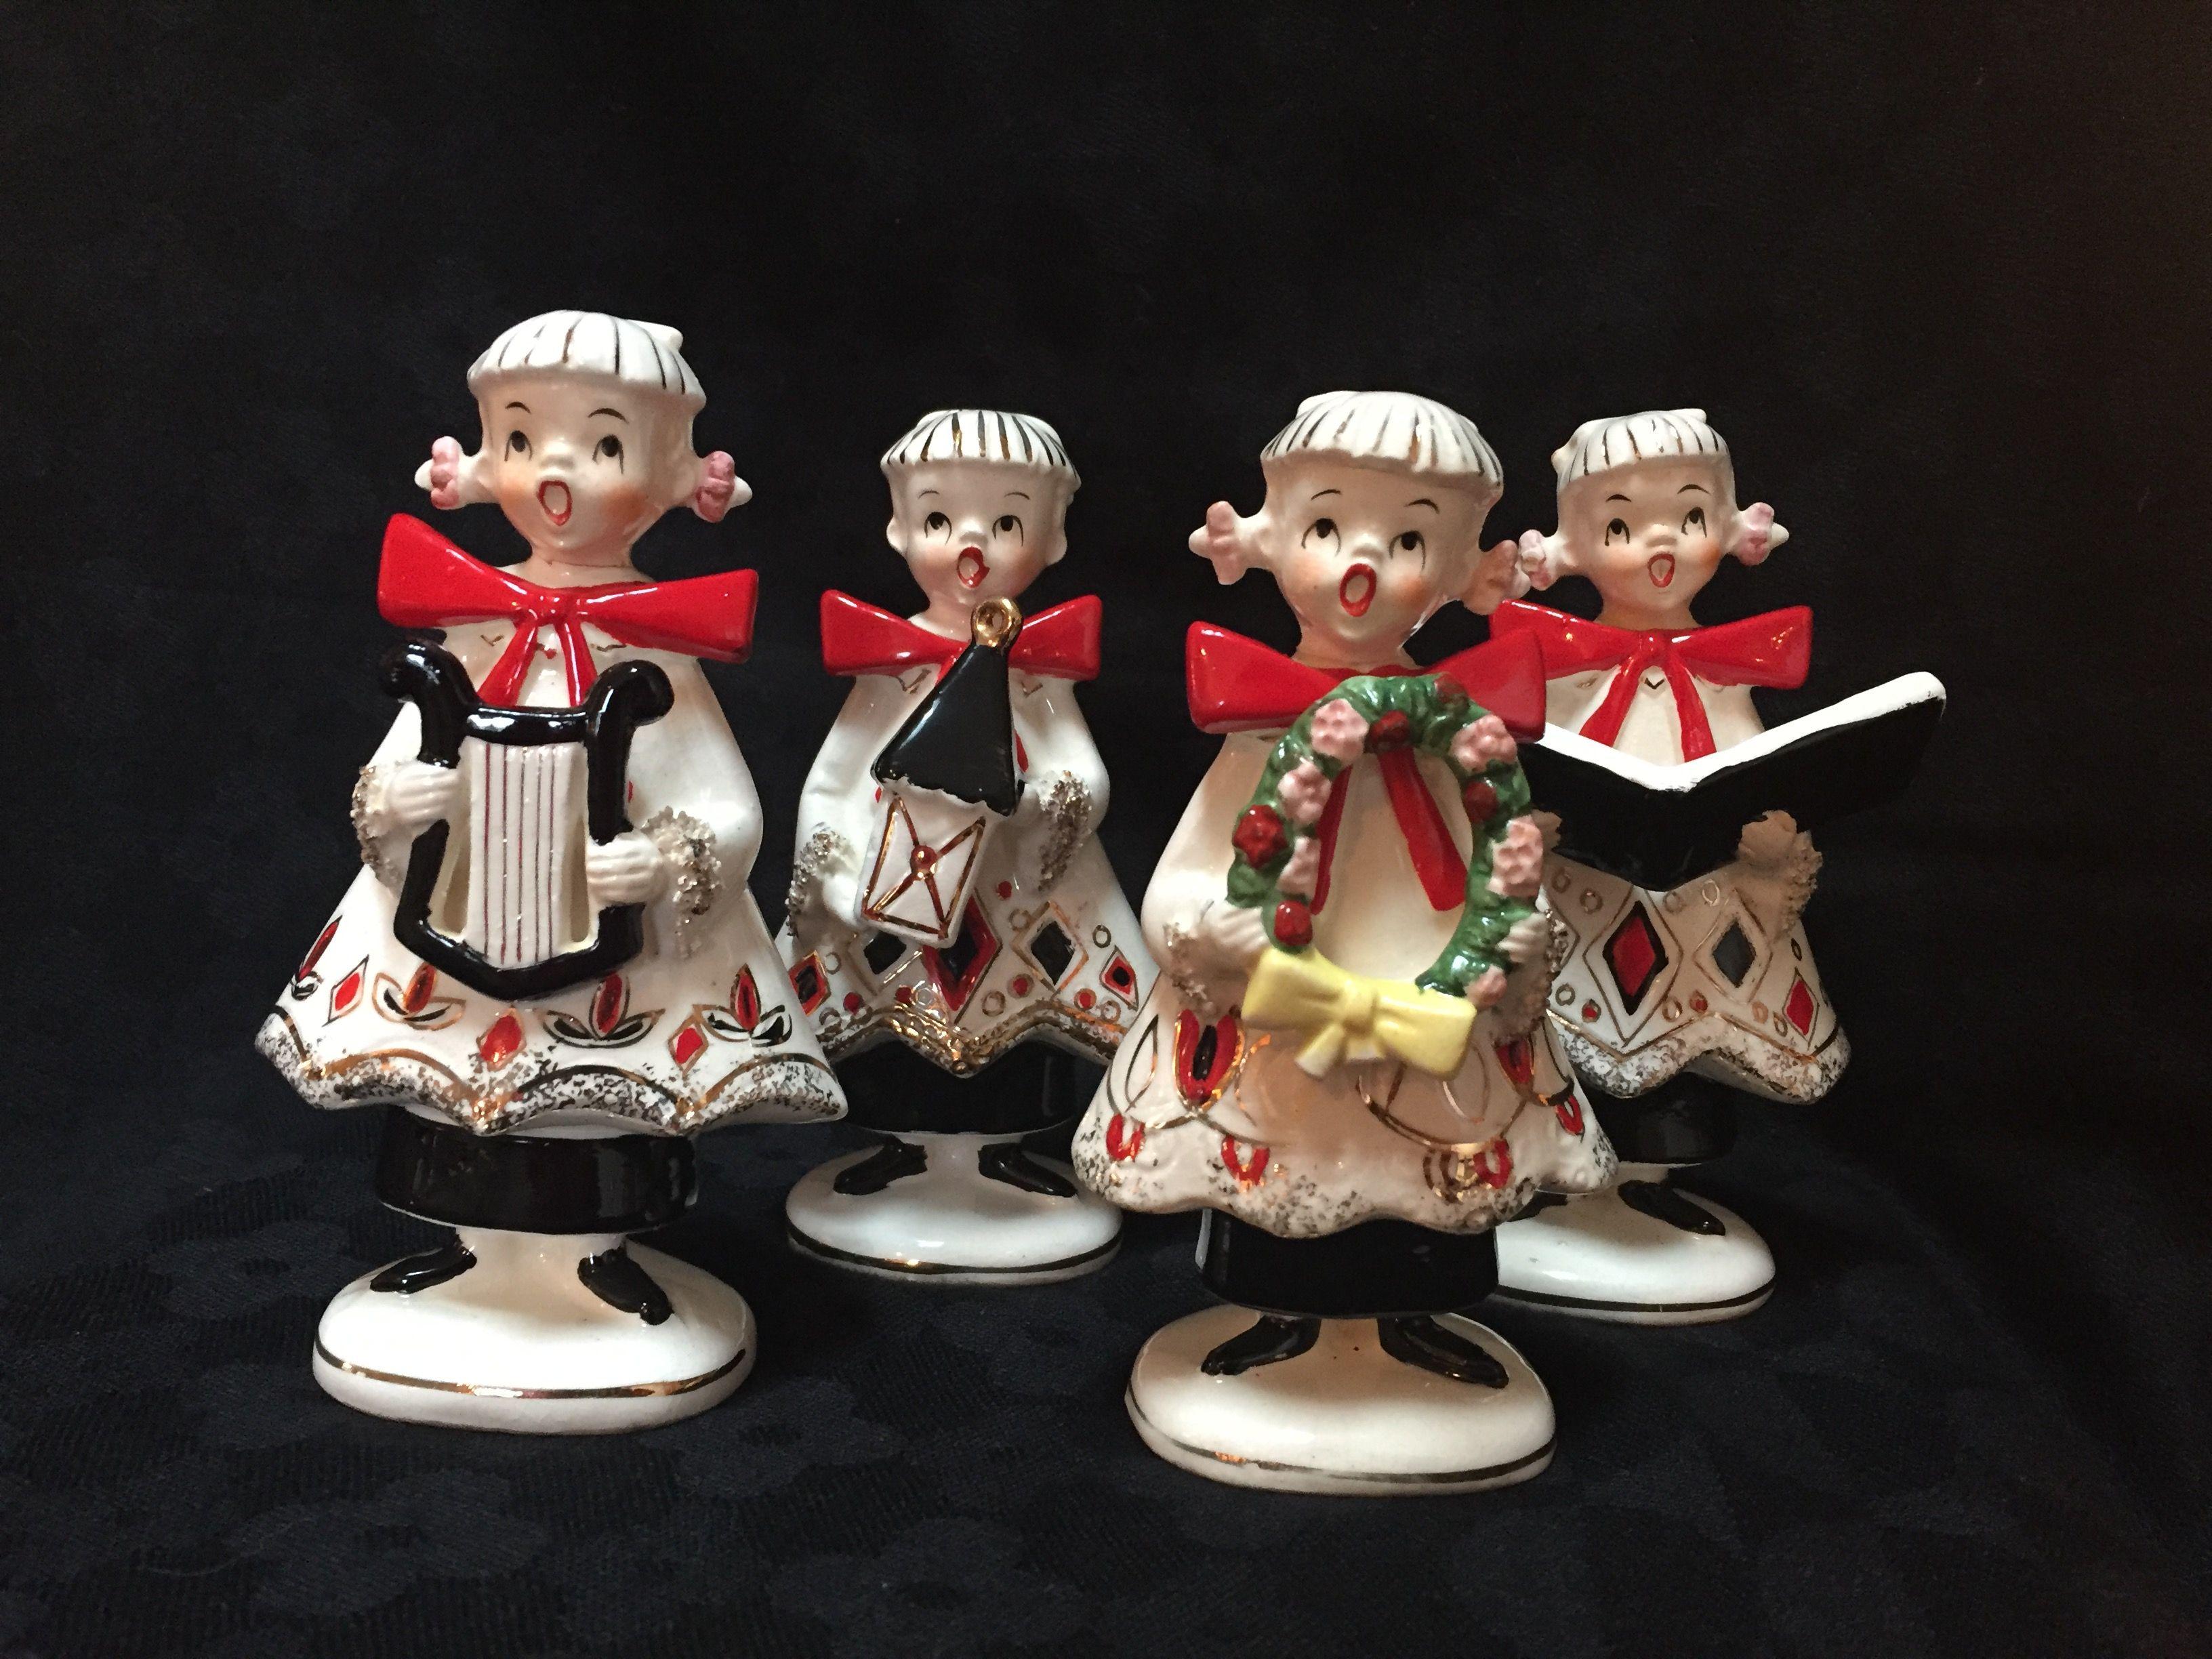 Christmas carolers figurines for sale - Vintage Christmas Carolers Figurines